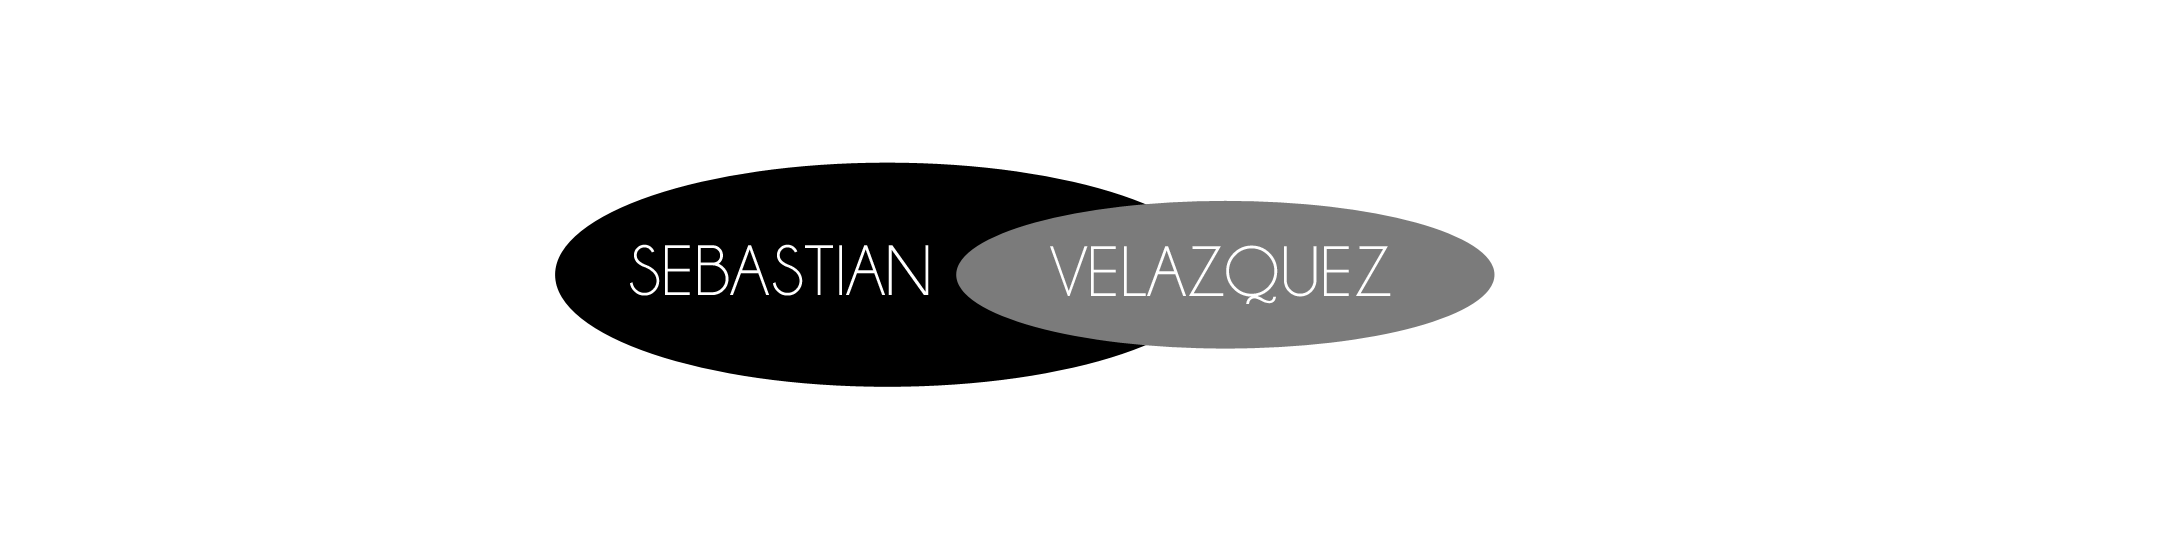 Sebastian Velazquez Portfolio